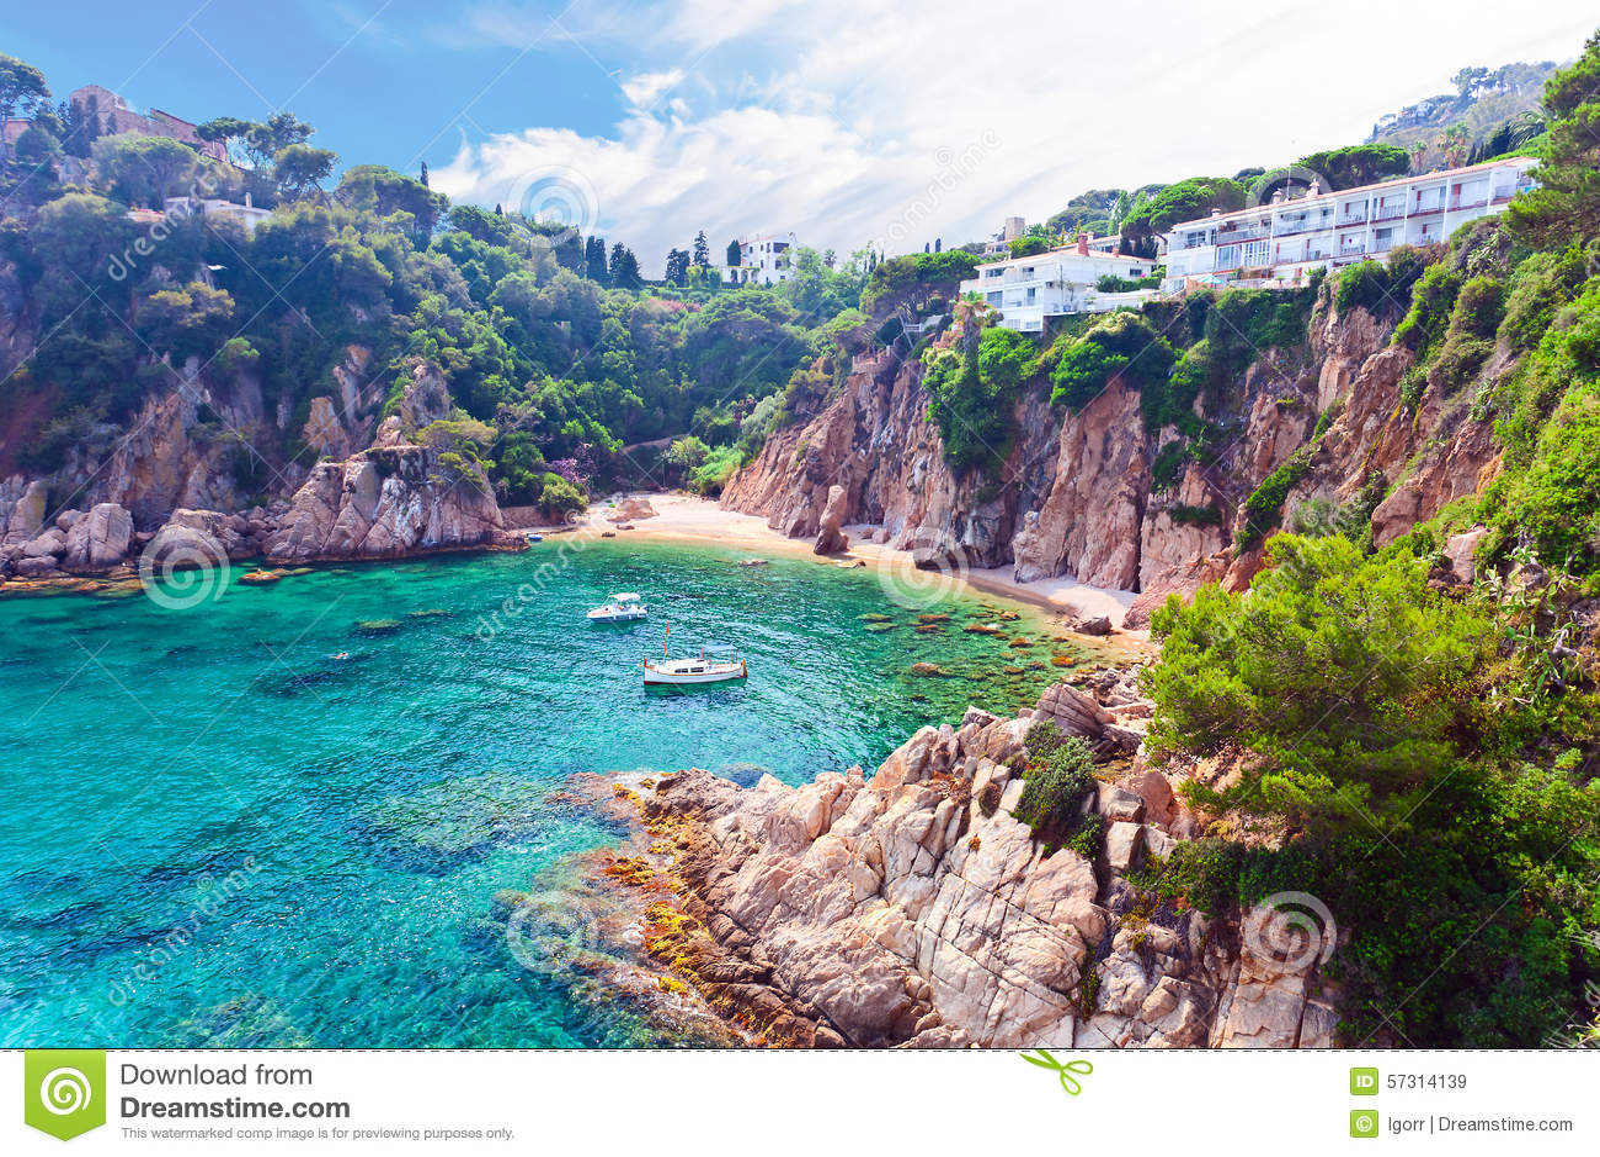 Mediterranean Coast Of Spain Stock Image - Image of water ...